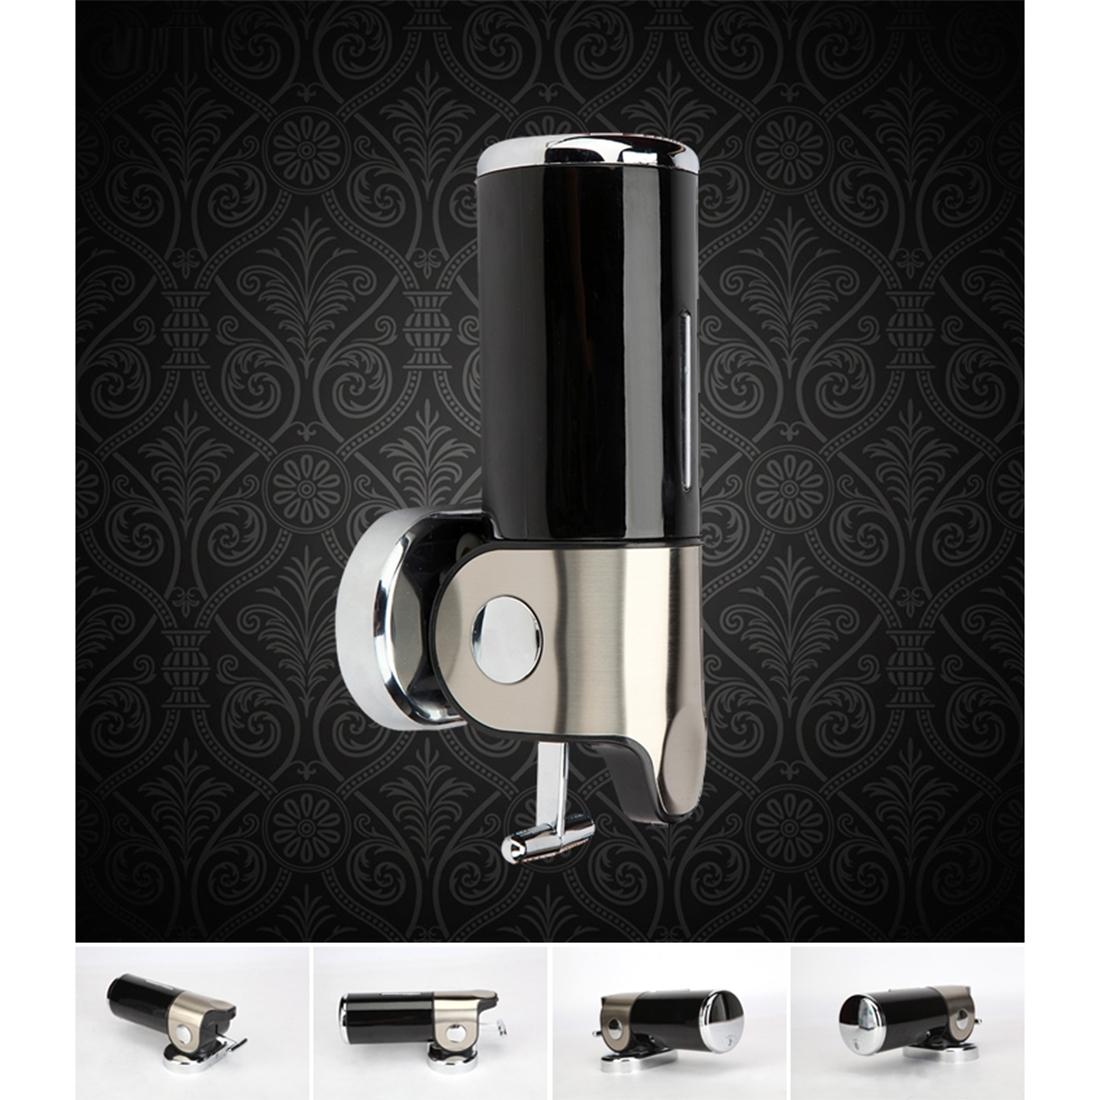 Dual Hotel Shower Manual Dispenser Wall Mounted Washing Liquid Shampoo Soap Bottle, Capacity: 1000ml (Dark Red)